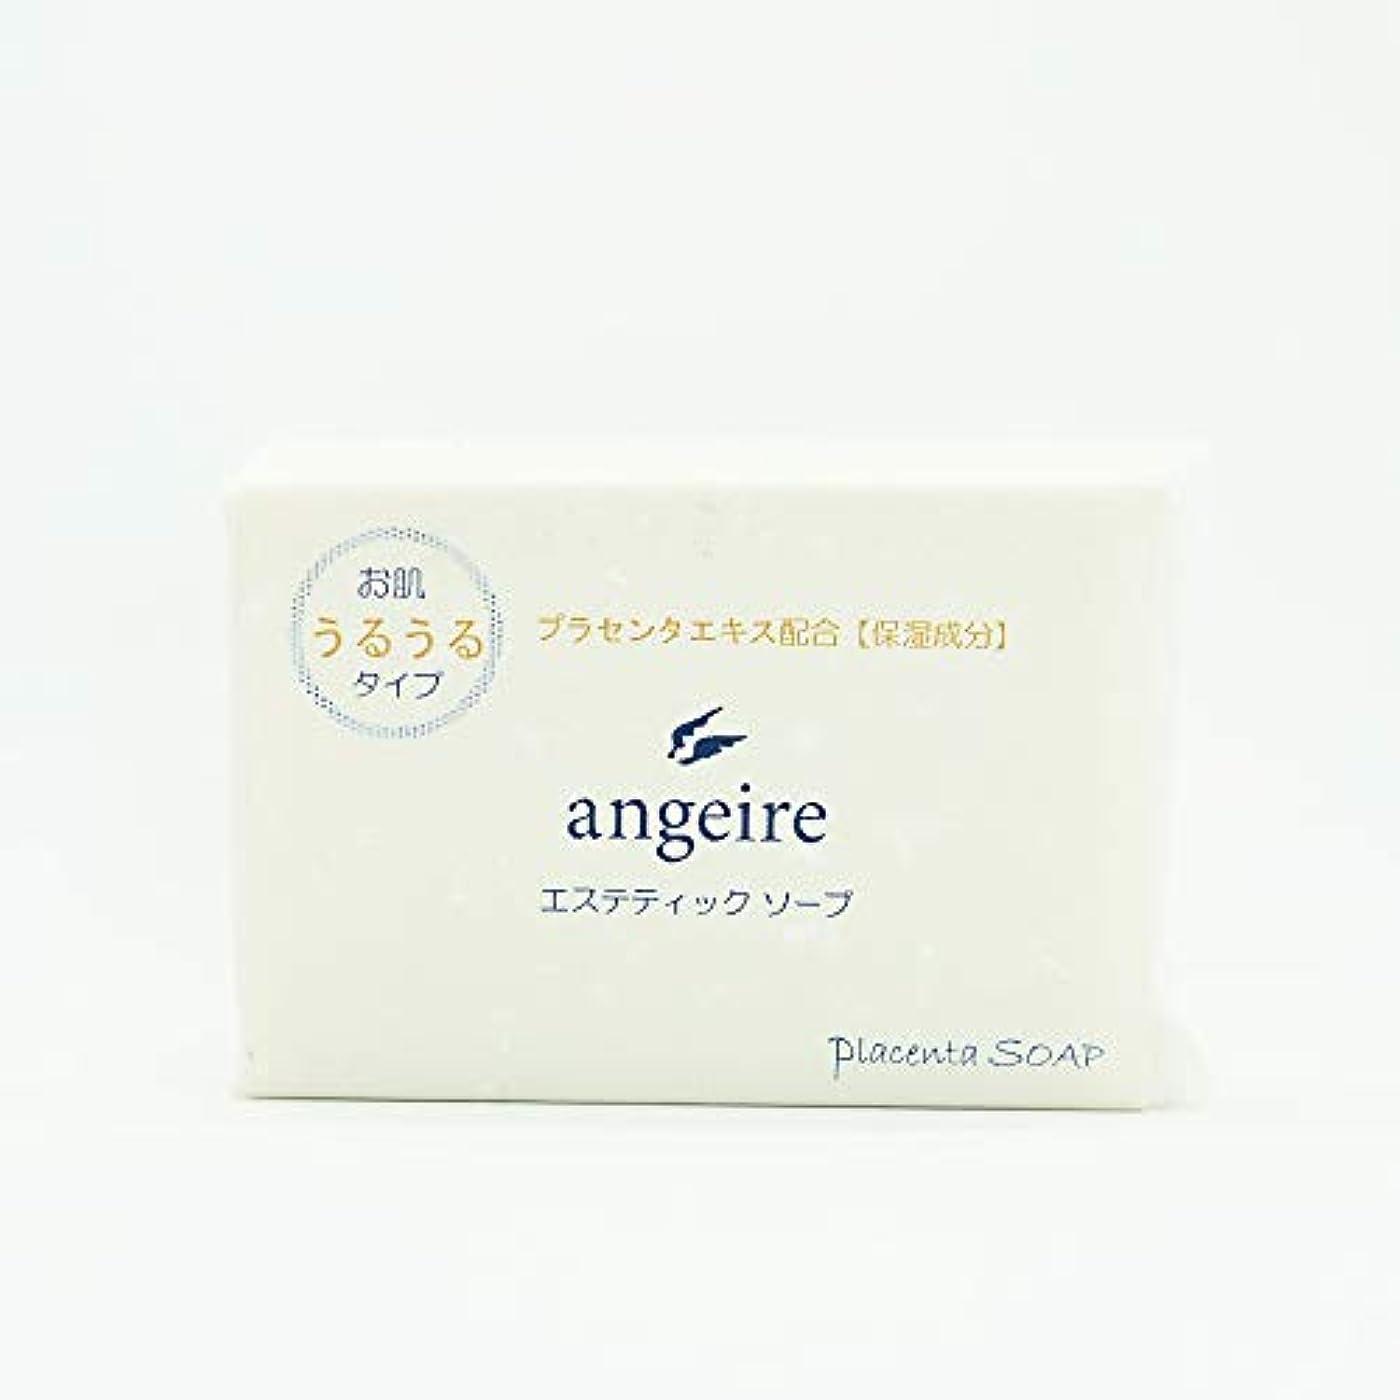 angeire エステティックソープ お肌うるうるタイプ 天然アロマの香り